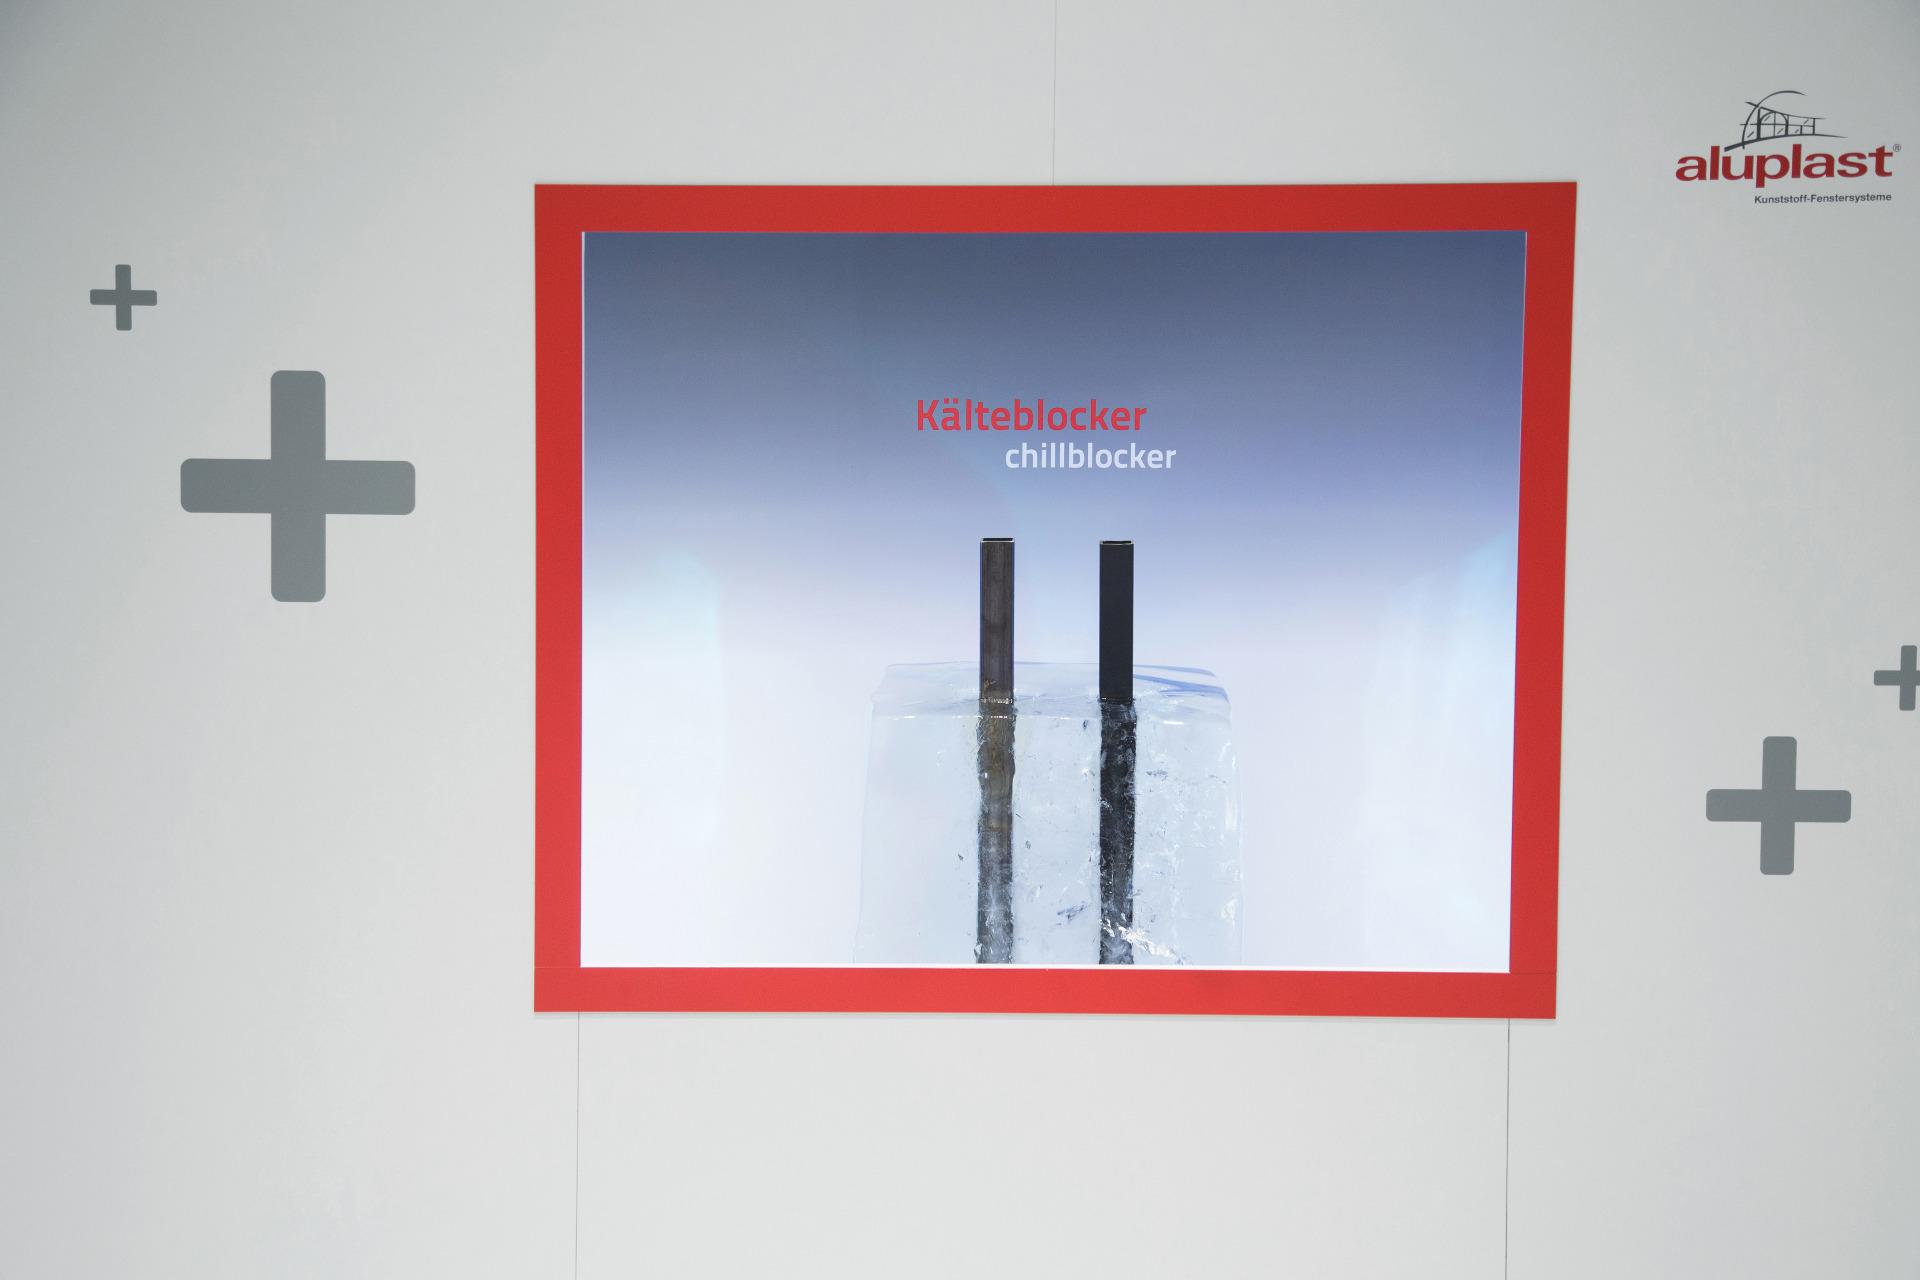 Fensterkonfigurator aluplast  TOP100: Preisgekrönte Innovationsleistung - aluplast